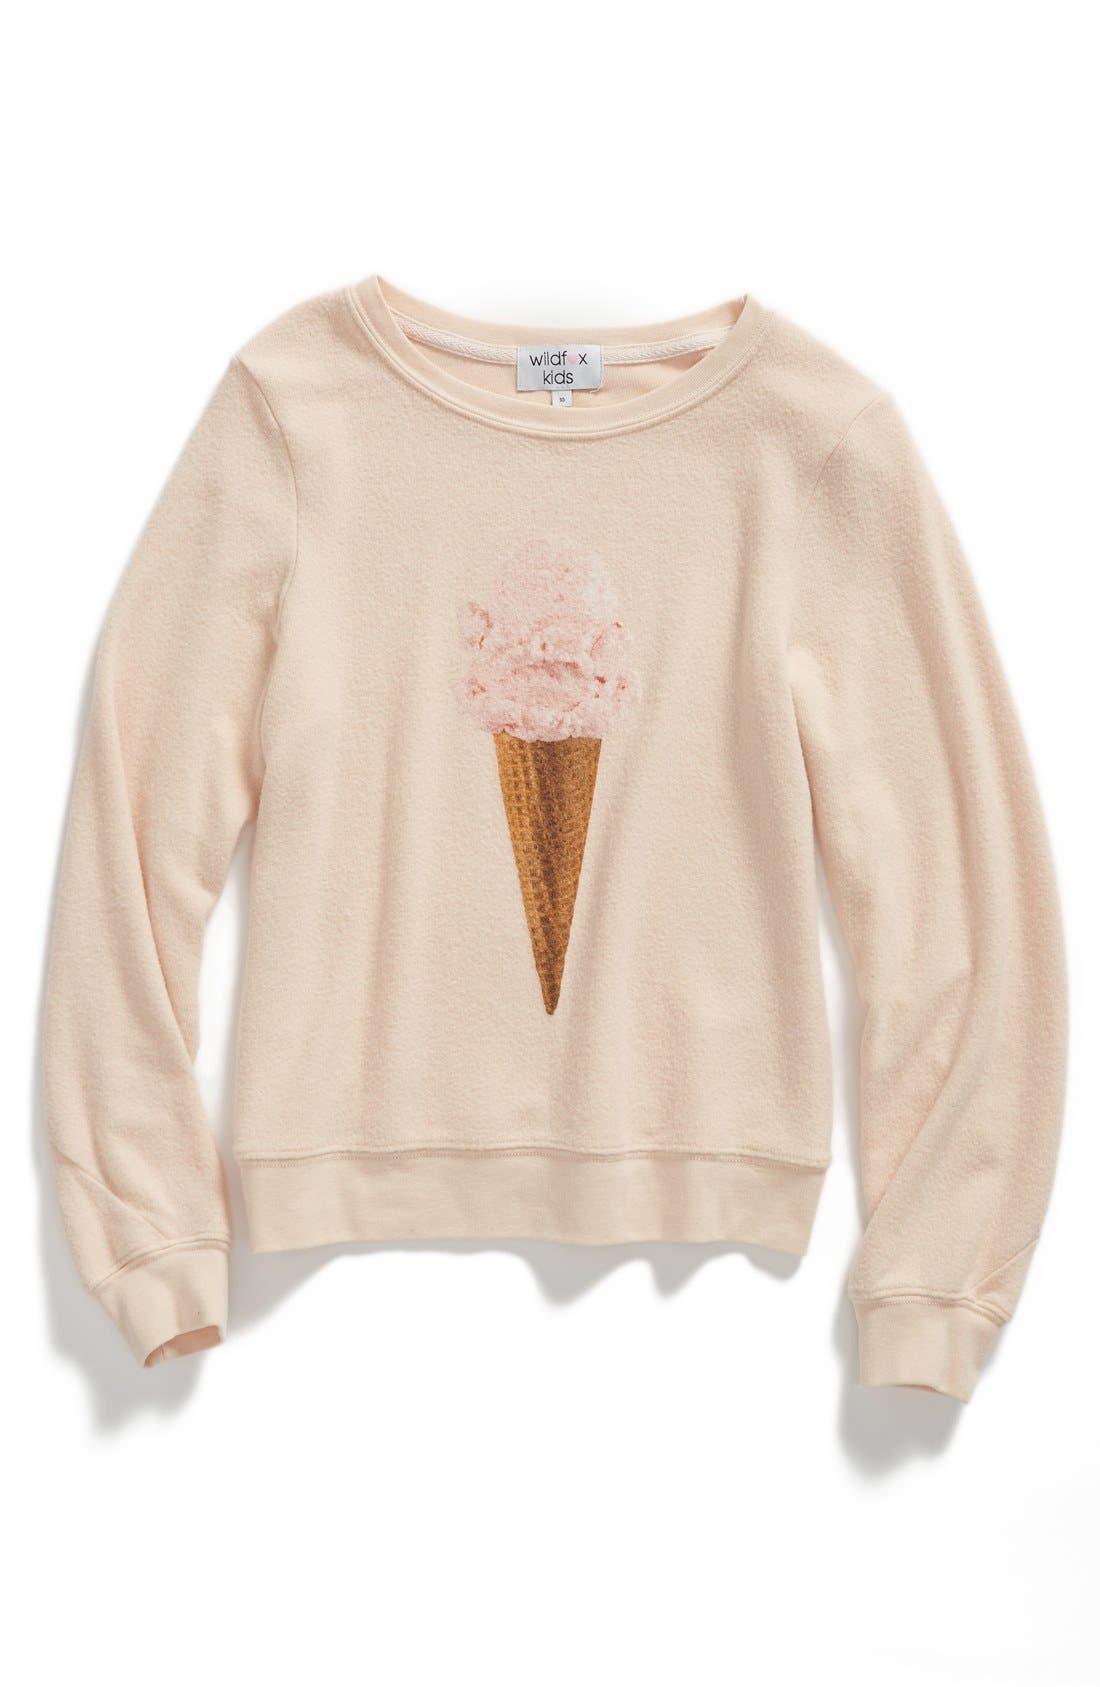 Alternate Image 1 Selected - Wildfox 'Breakfast - Baggy Beach Jumper' Sweatshirt (Little Girls & Big Girls)